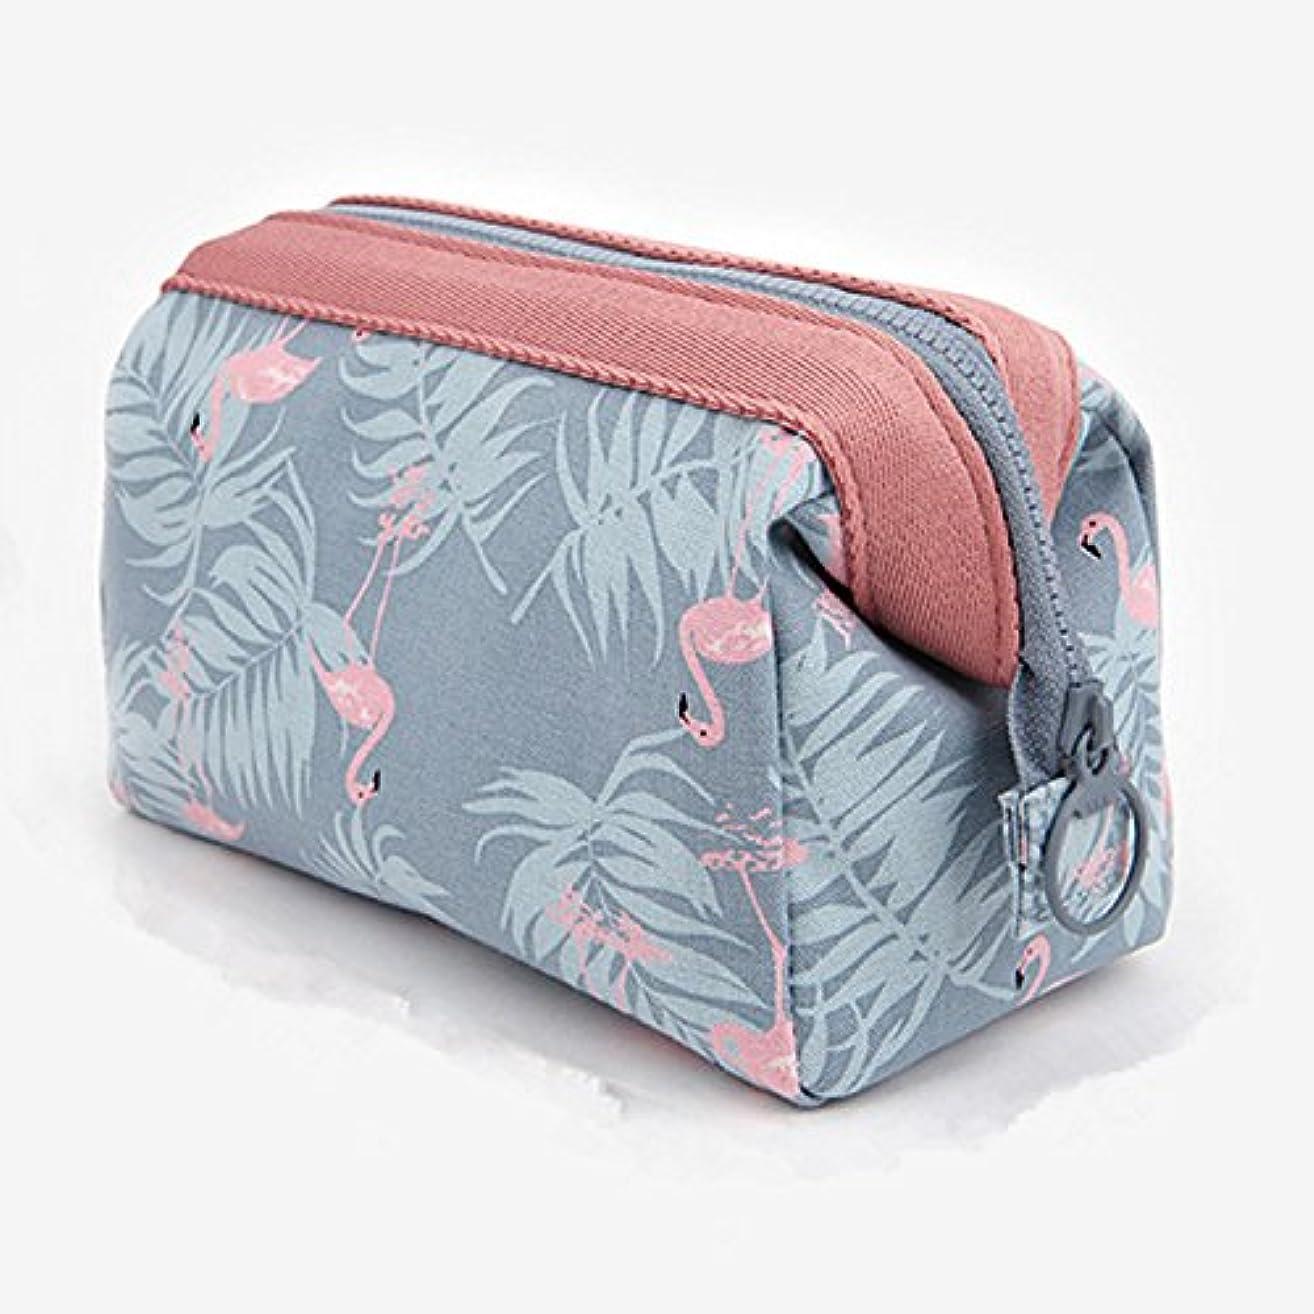 Cindaralla 多機能立体大容量トラベルバッグ収納バッグ婦人用洗える防水化粧品バッグフラミンゴ柄化粧品バッグ旅行化粧品バッグ 気配りの行き届いたサービス (Style : Sky blue flamingo)